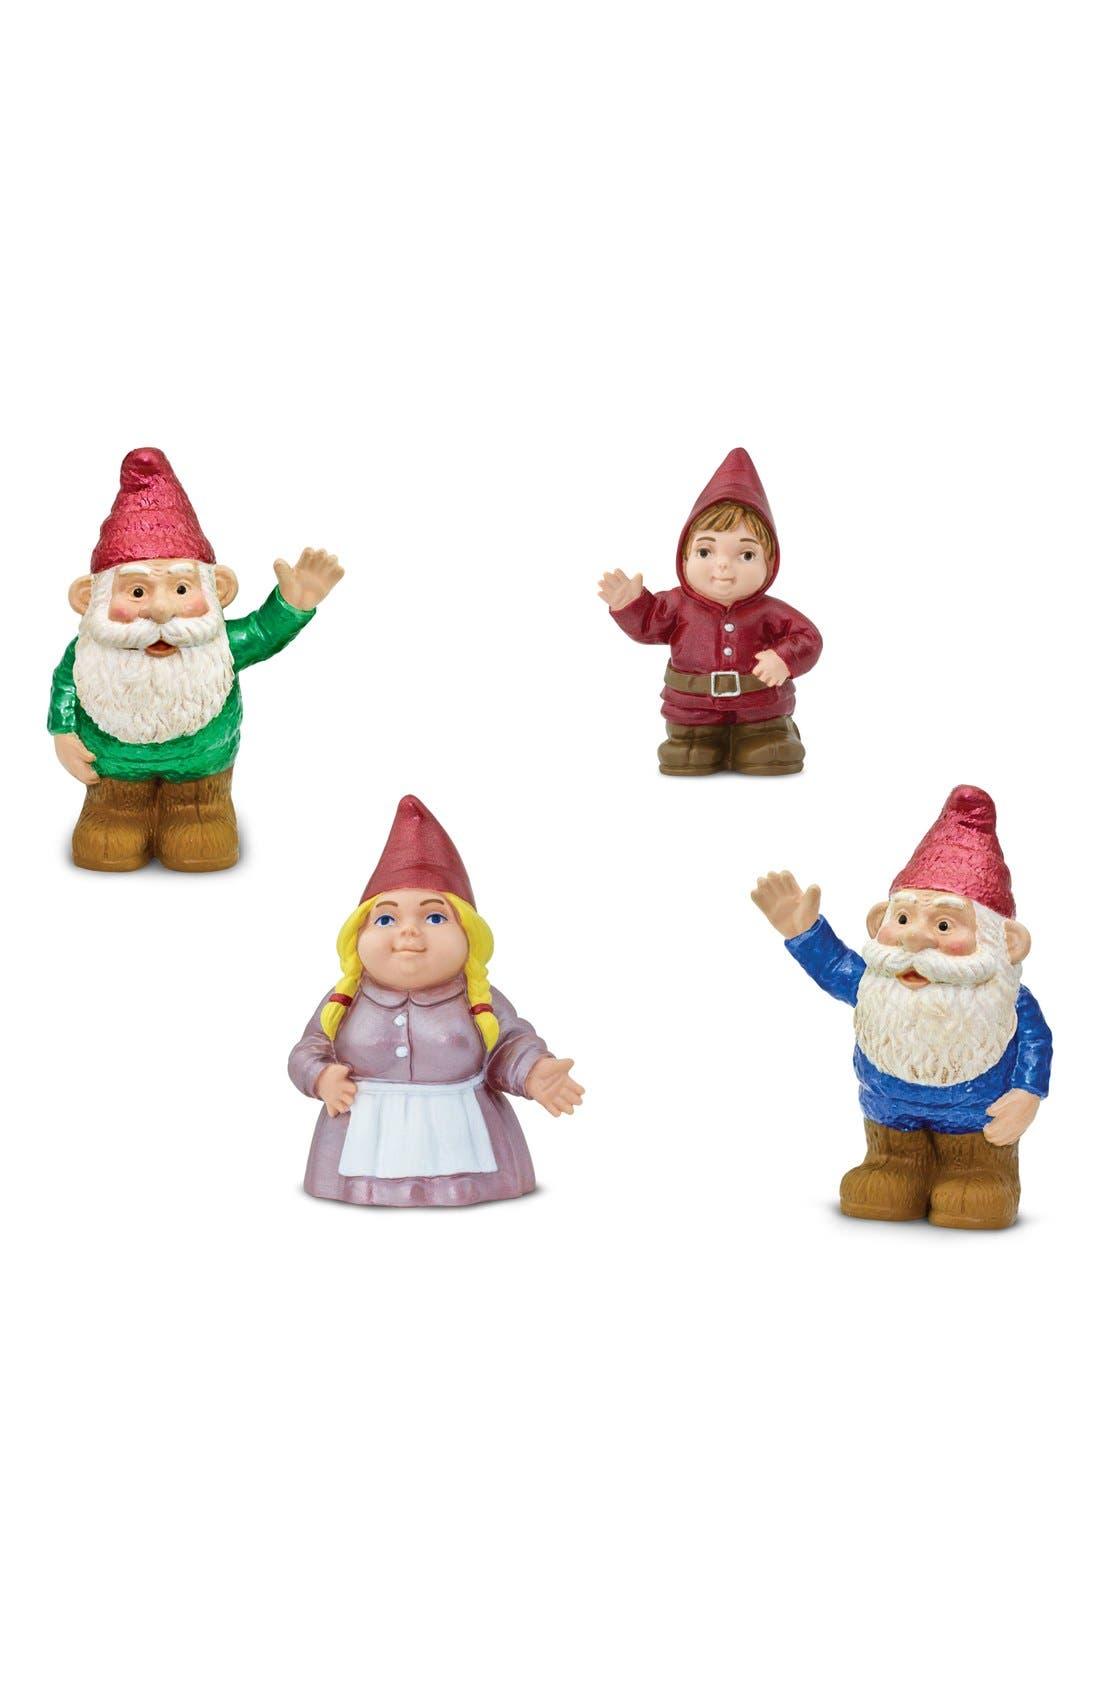 Gnome Family Figurines,                             Main thumbnail 1, color,                             BLUE